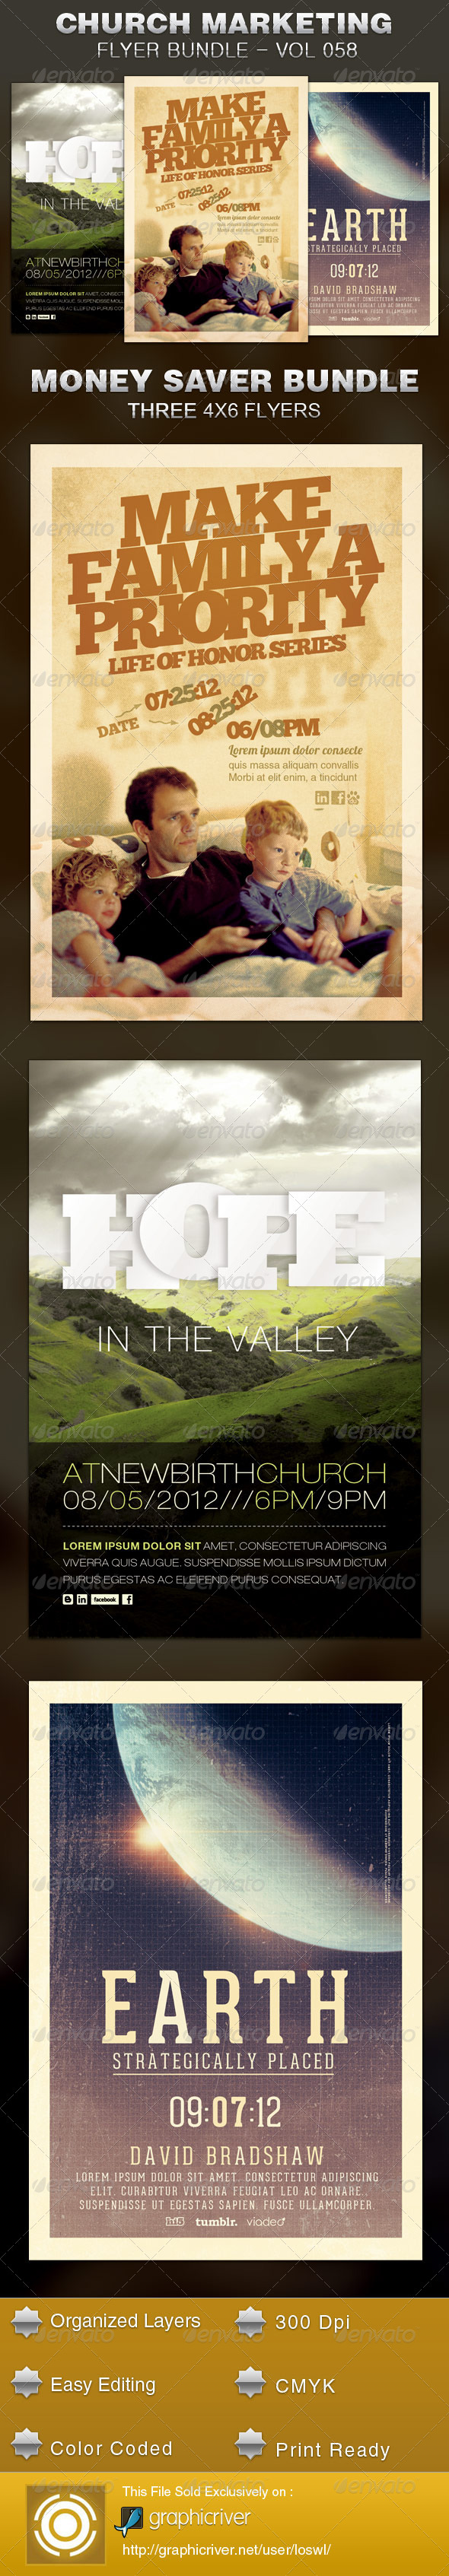 Church Marketing Flyer Template Bundle Vol 058